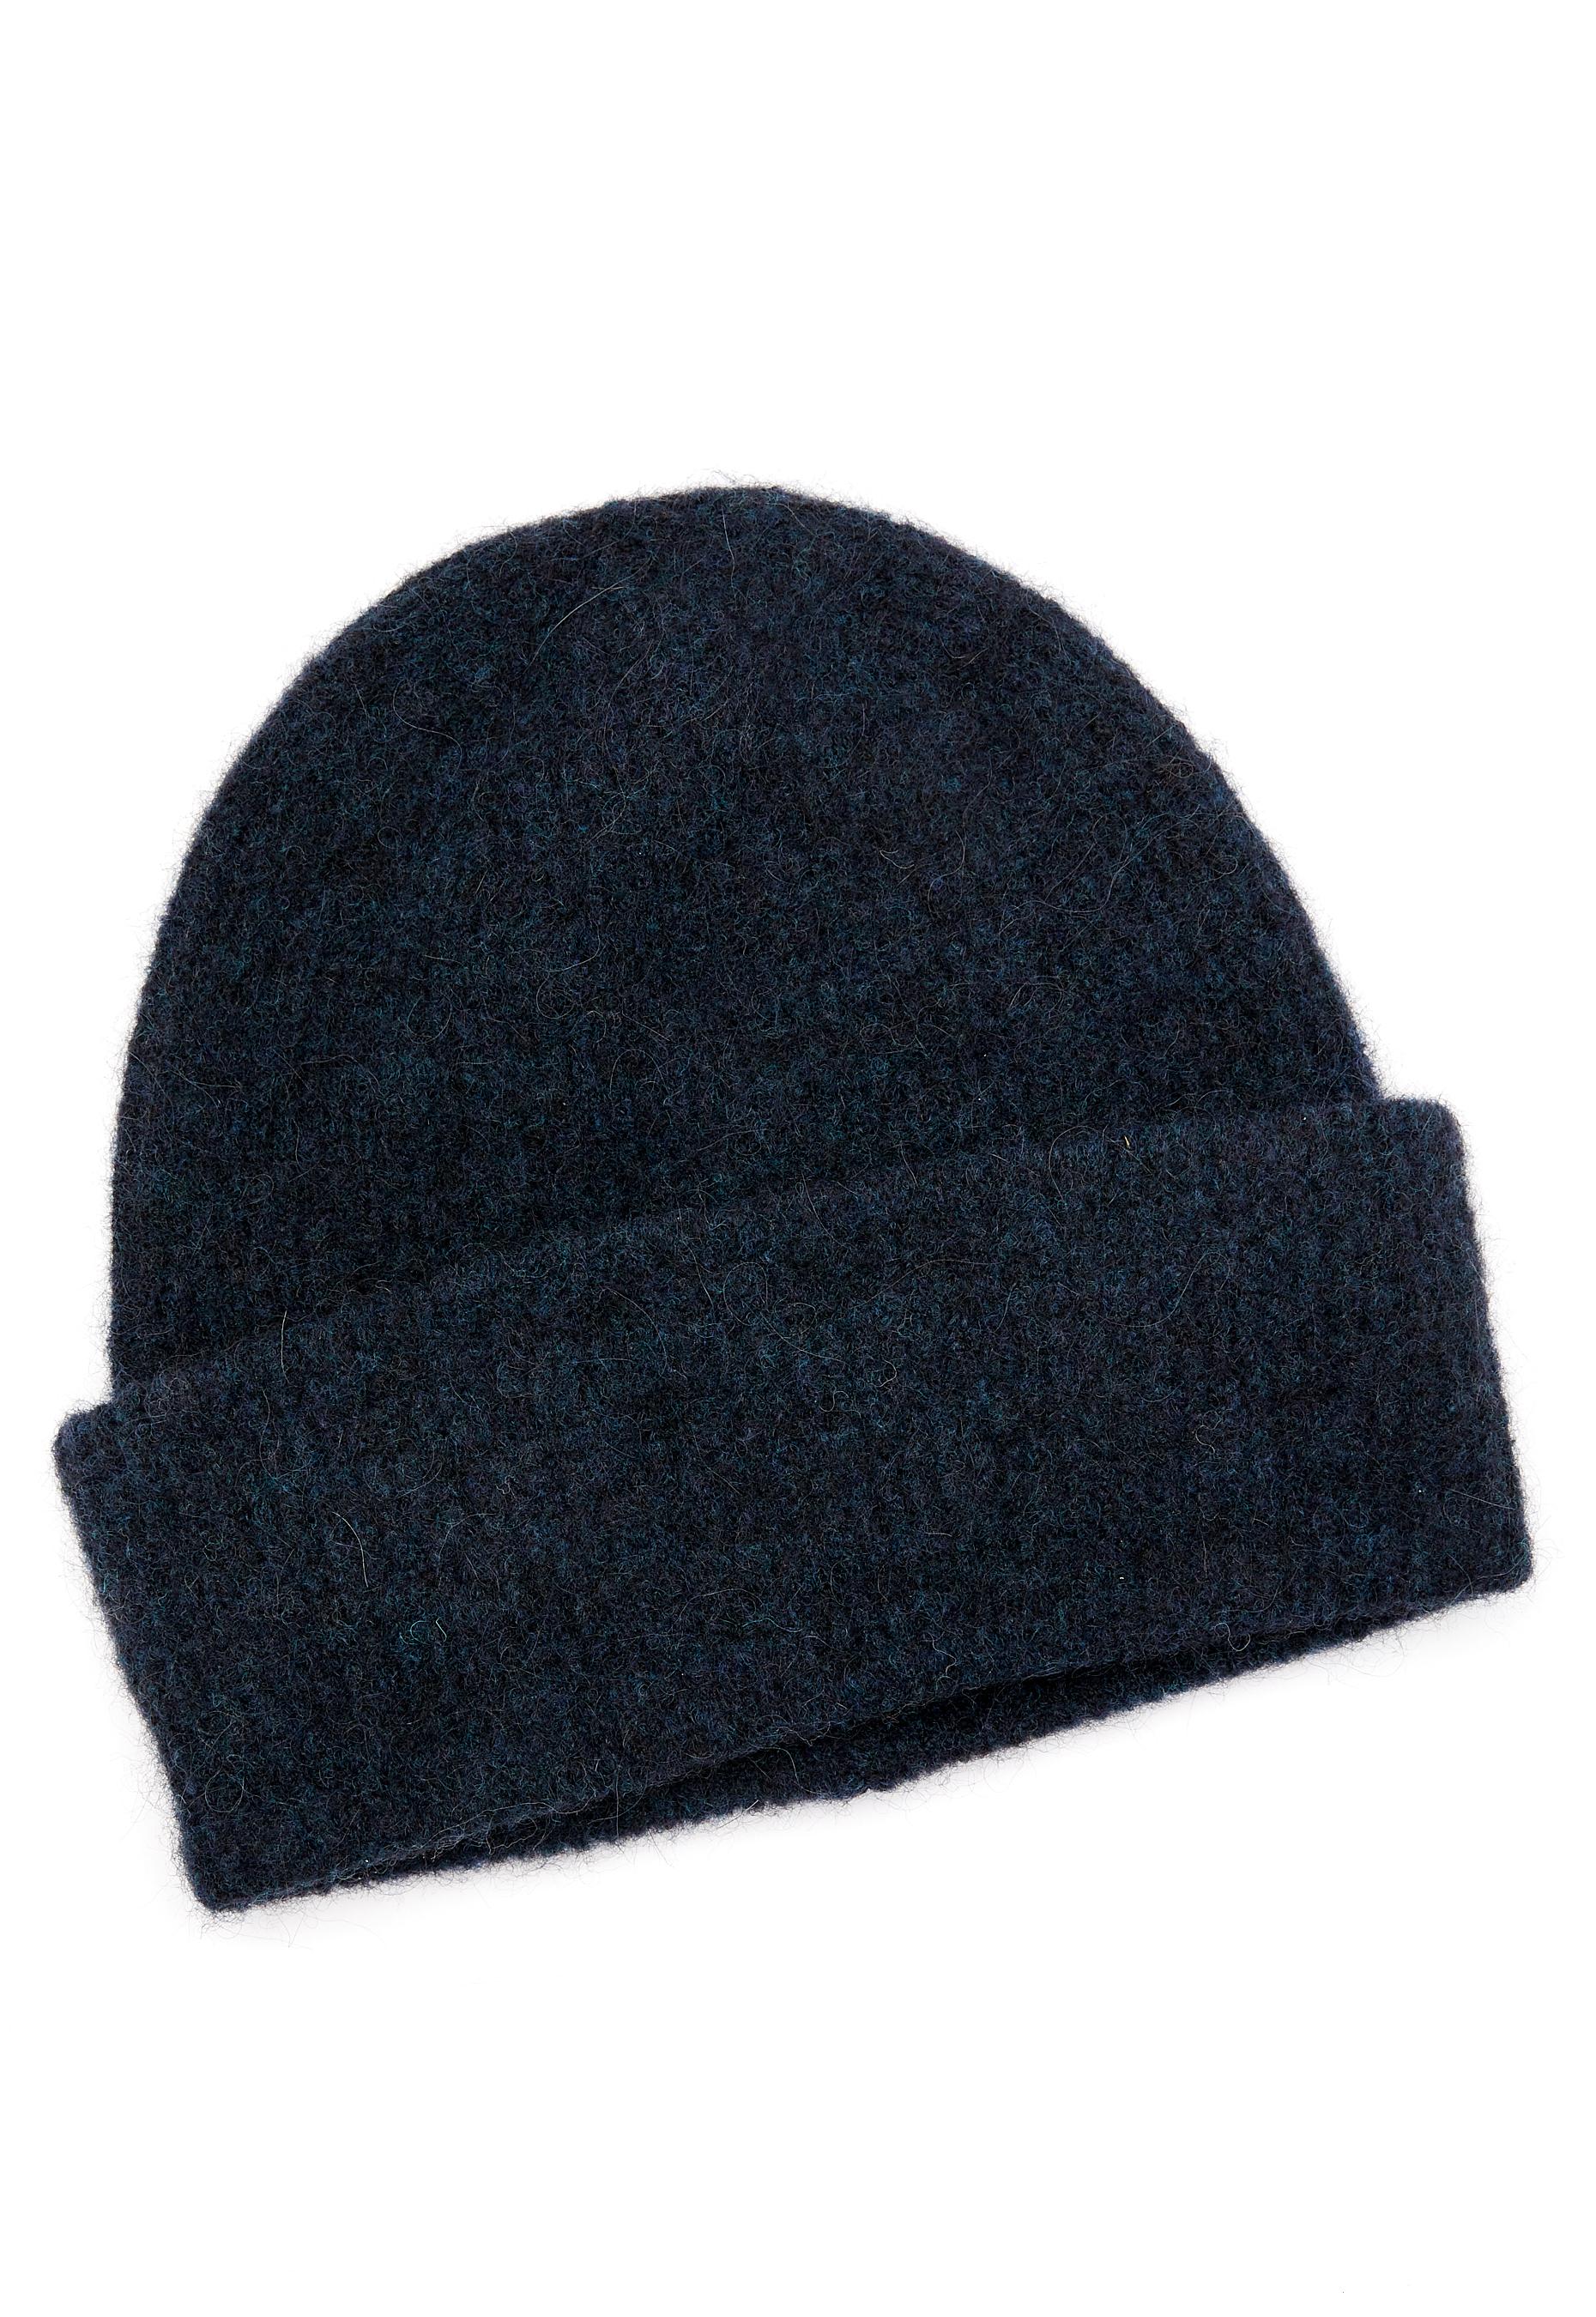 ca06b551 Samsøe & Samsøe Nor Hat Dark Blue Melange - Bubbleroom